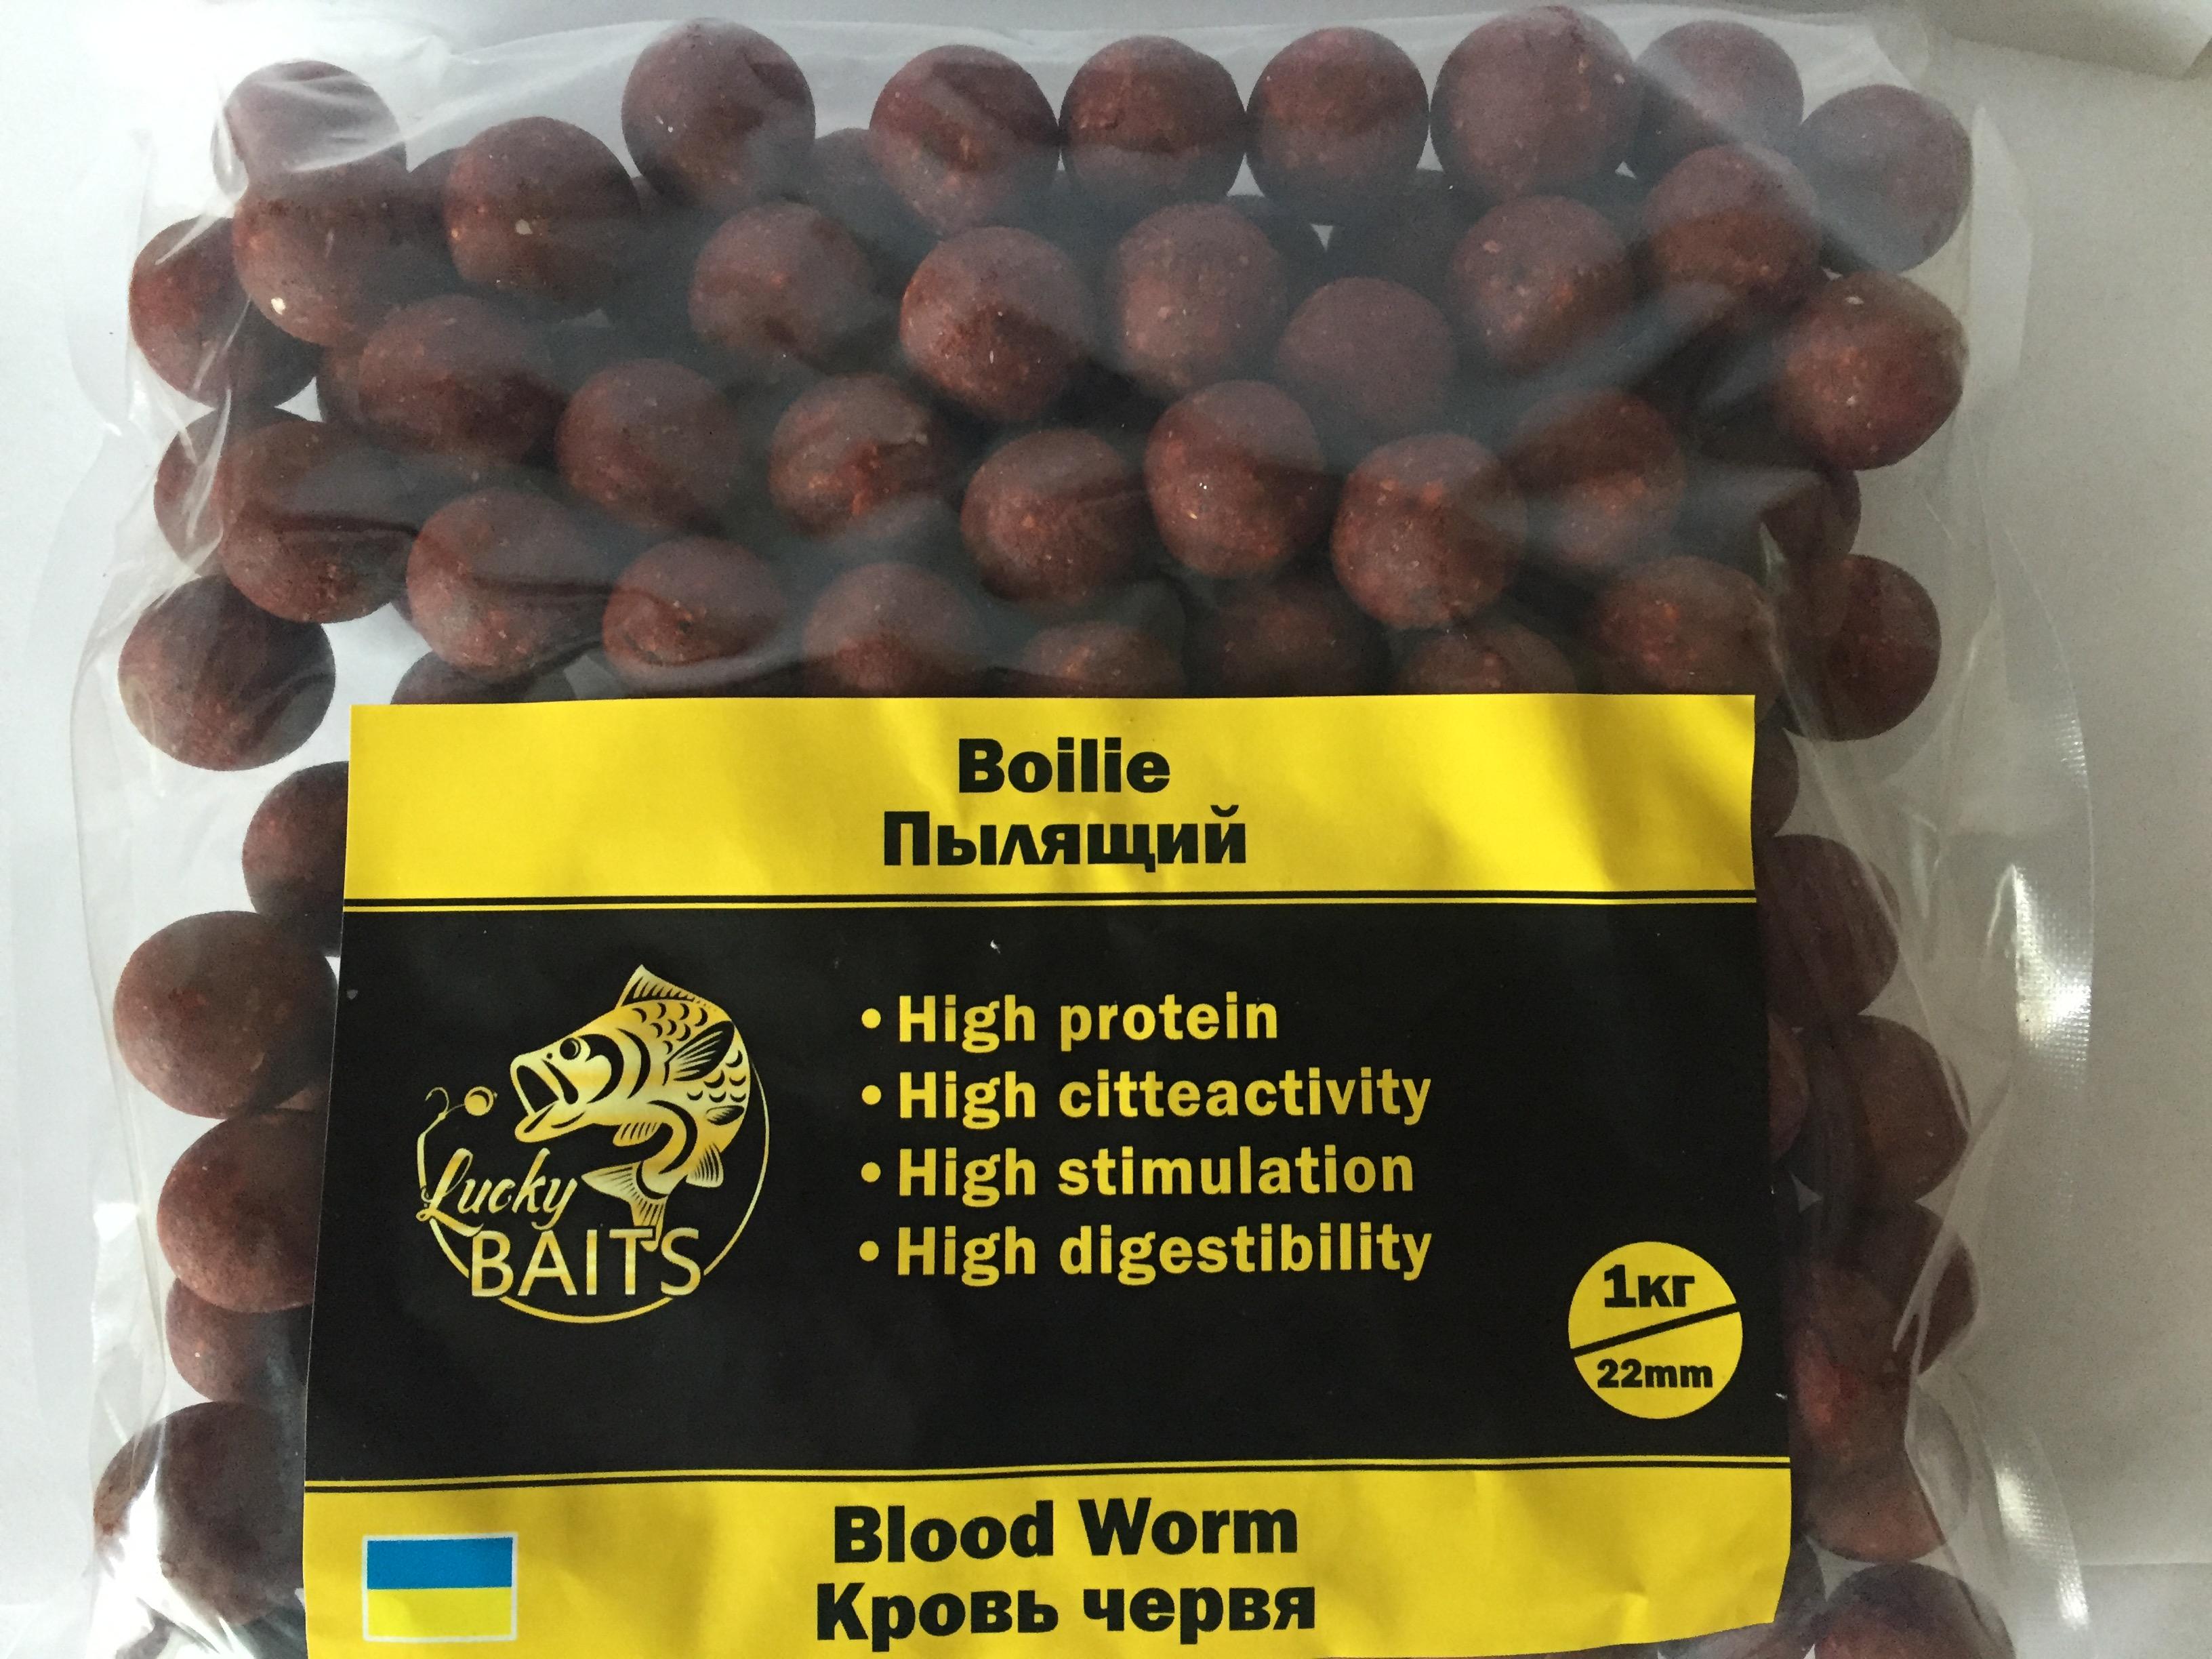 Lucky Baits Blood Worm (кровь червя пылящий)